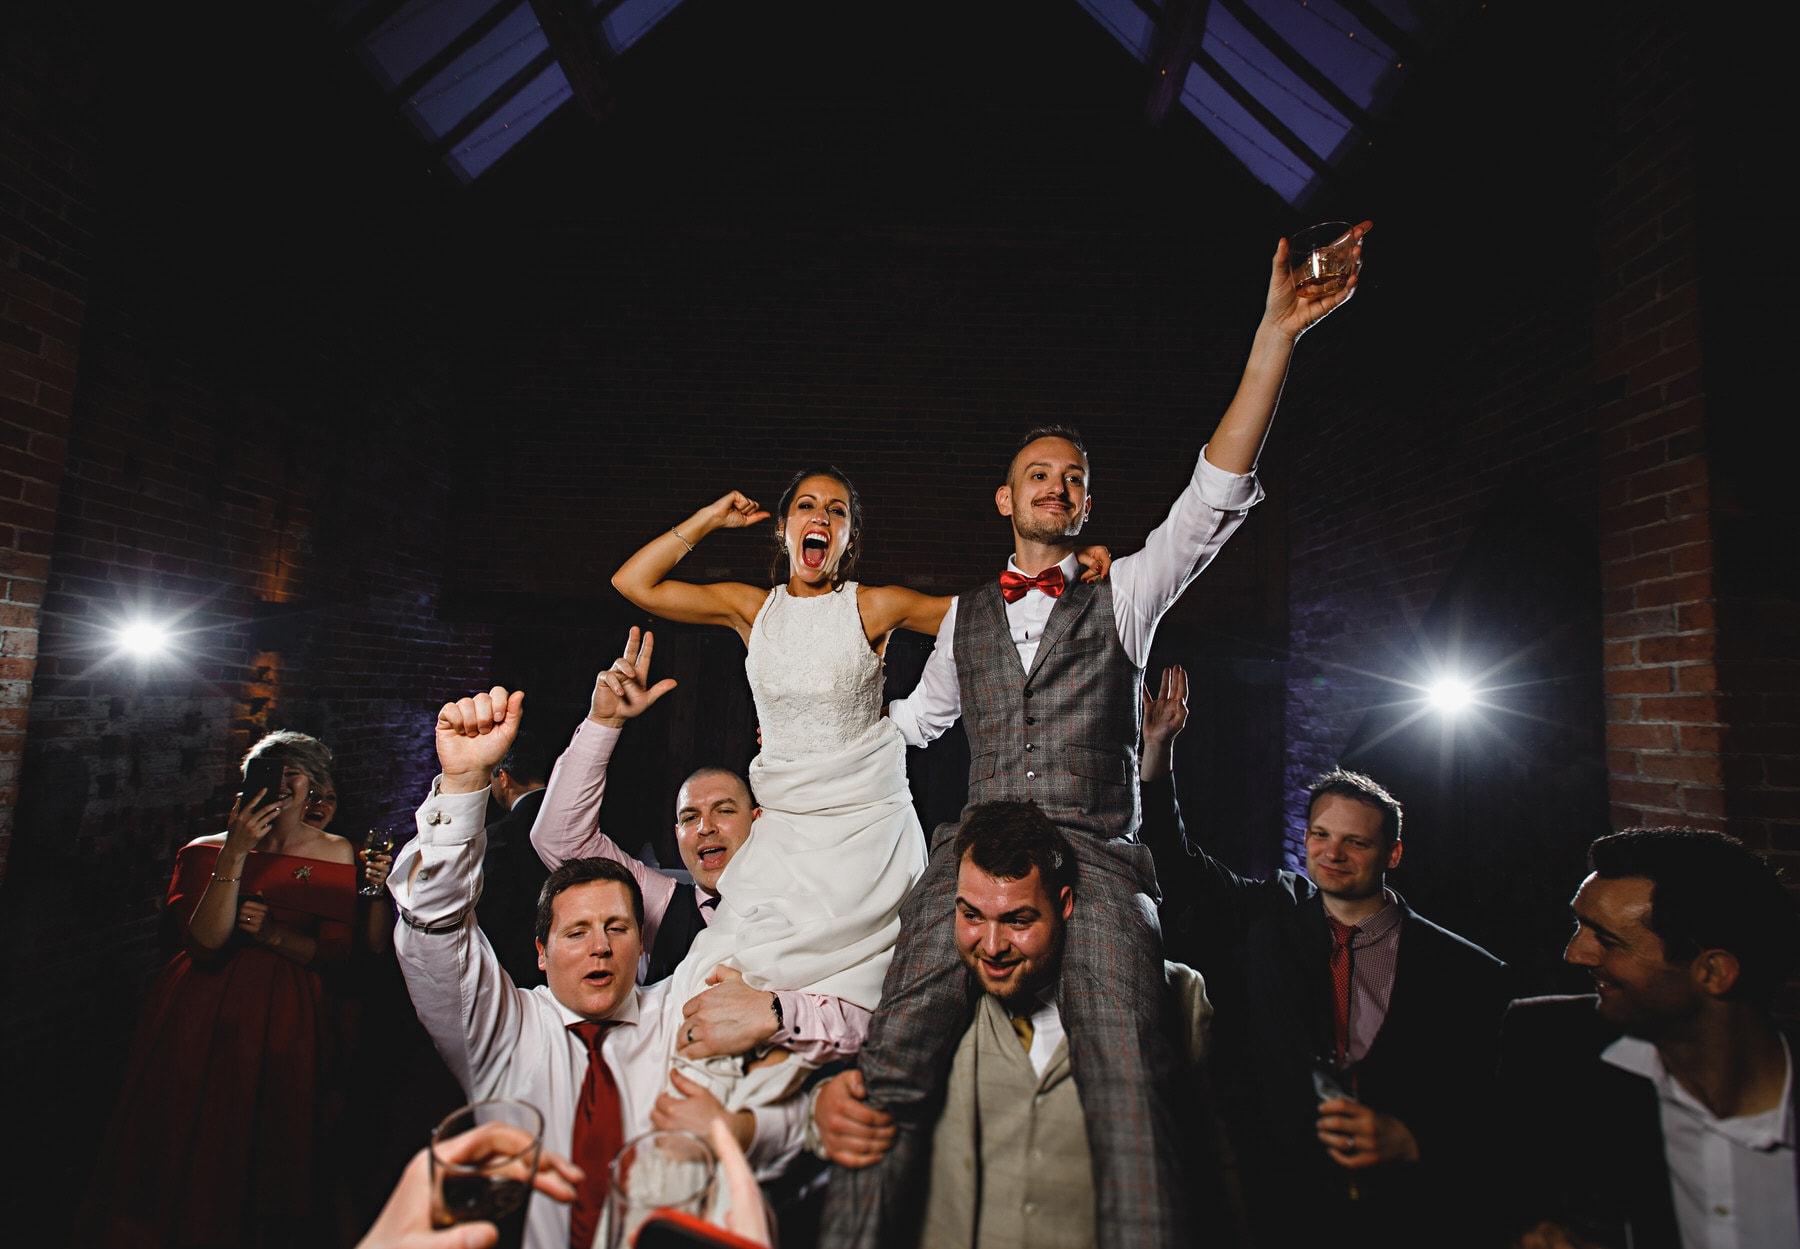 the bride and groom dancing at Shustoke Barns in Warwickshire